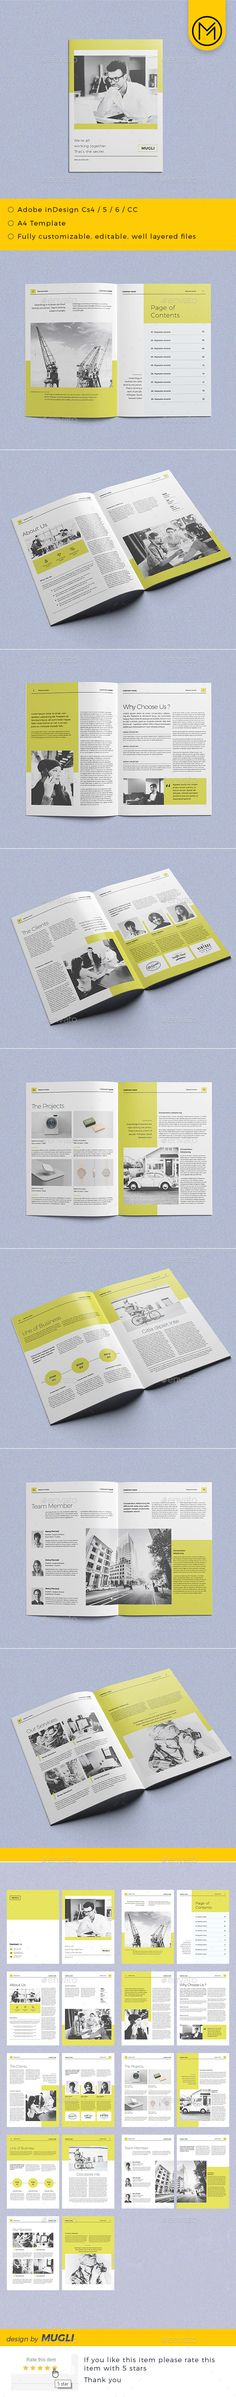 Simple & Clean Brochure - #Corporate #Brochures Download here: https://graphicriver.net/item/simple-clean-brochure/19331896?ref=alena994